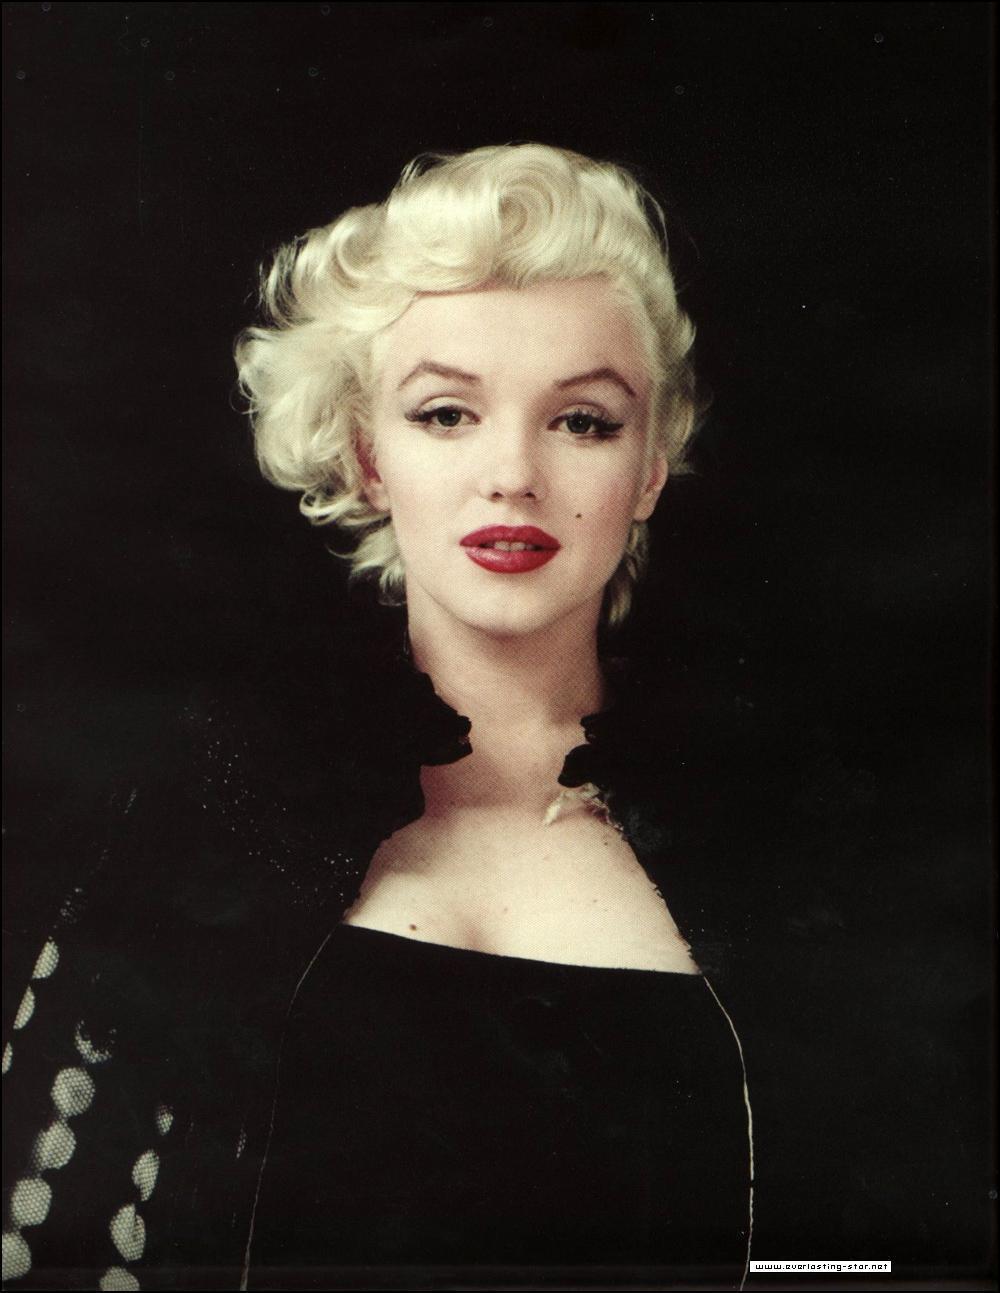 http://1.bp.blogspot.com/-uPU_Z3VPrME/T627U5RIMiI/AAAAAAAARmo/aye8LVJCo3U/s1600/Marilyn-Monroe-marilyn-monroe-12892778-1000-1293.jpg